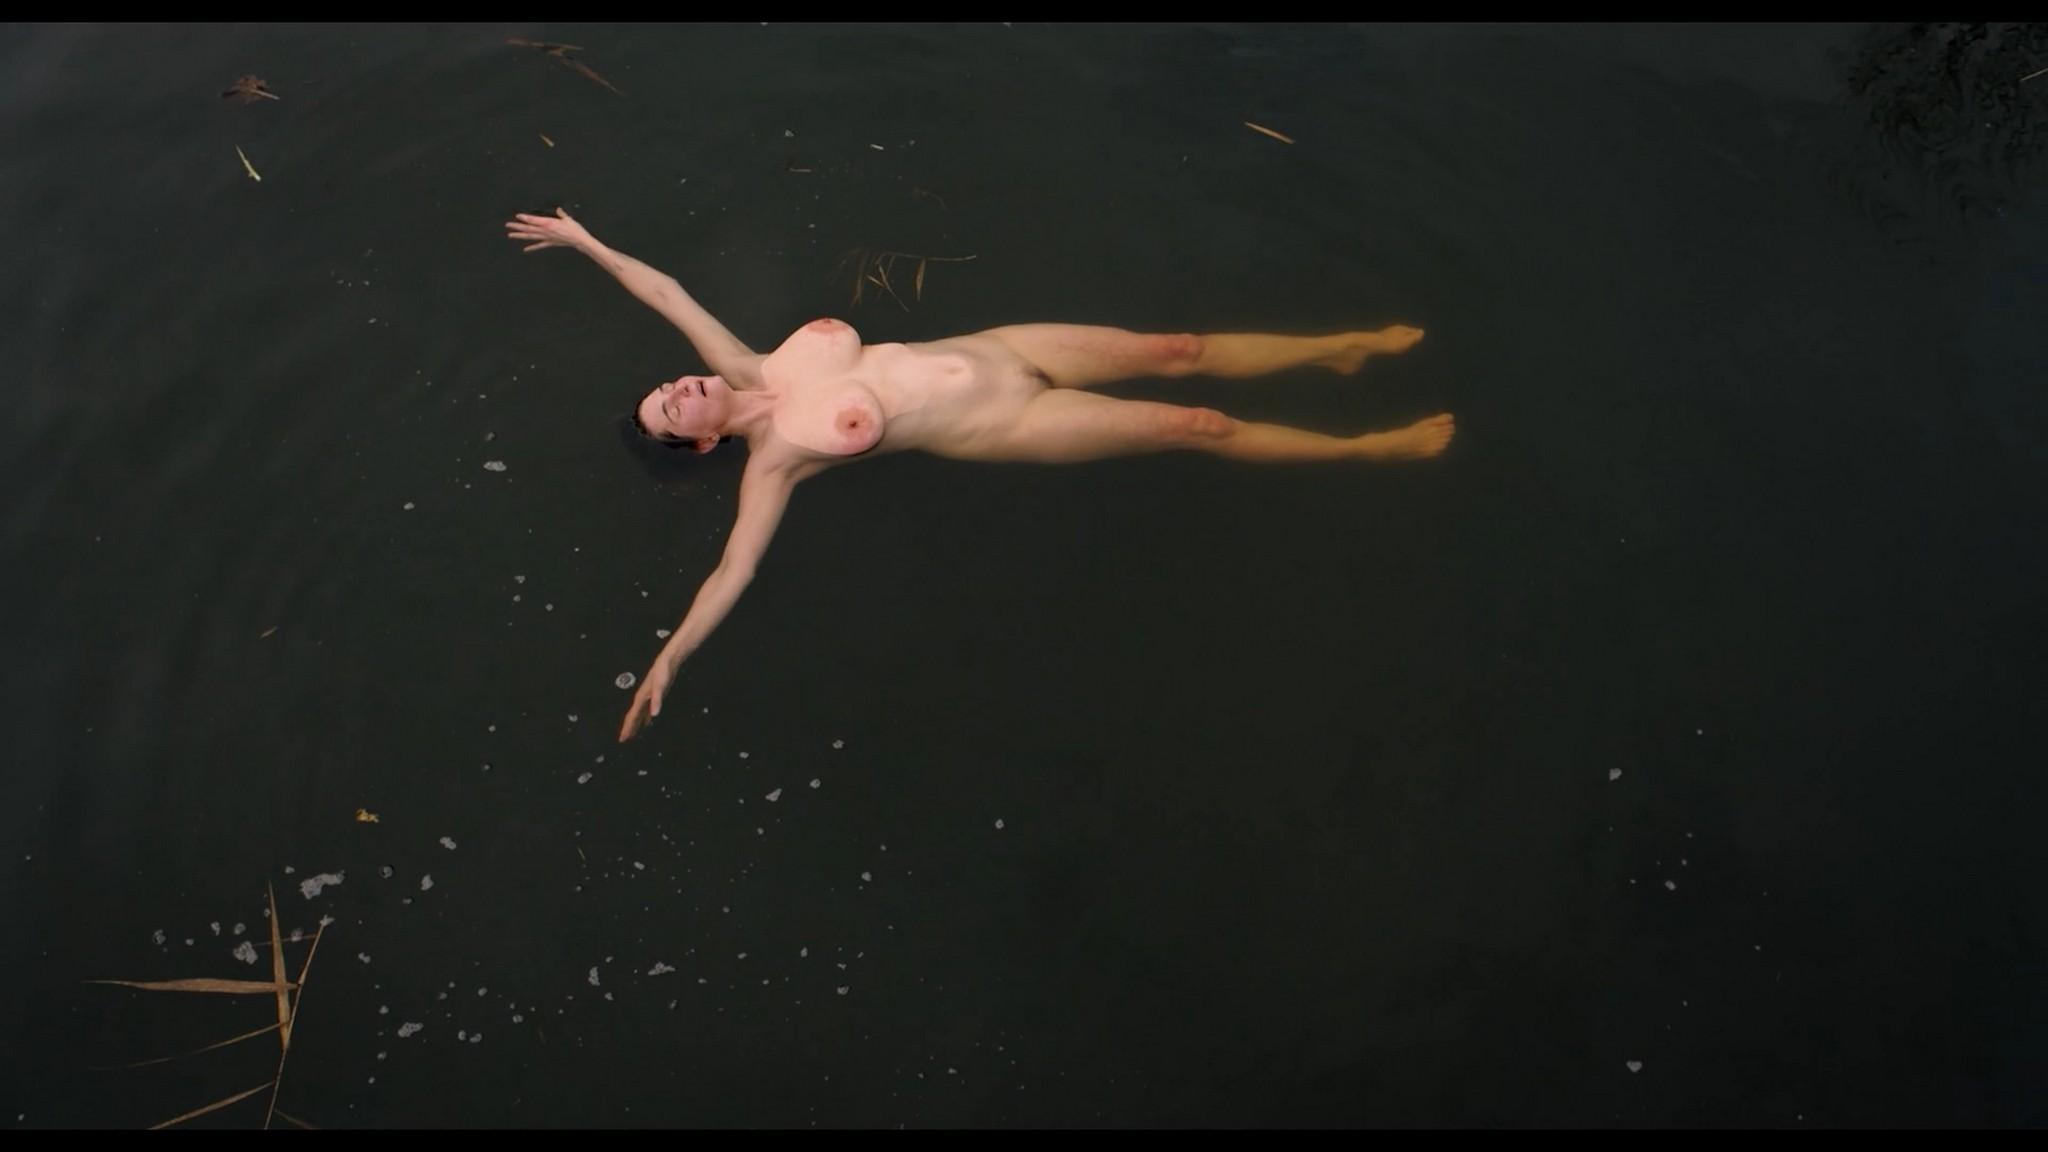 Antonia Bill nude full frontal Amanda da Gloria Helene Blechinger and others nude too Hitzig Ein Saunagang DE 2021 1080p 6